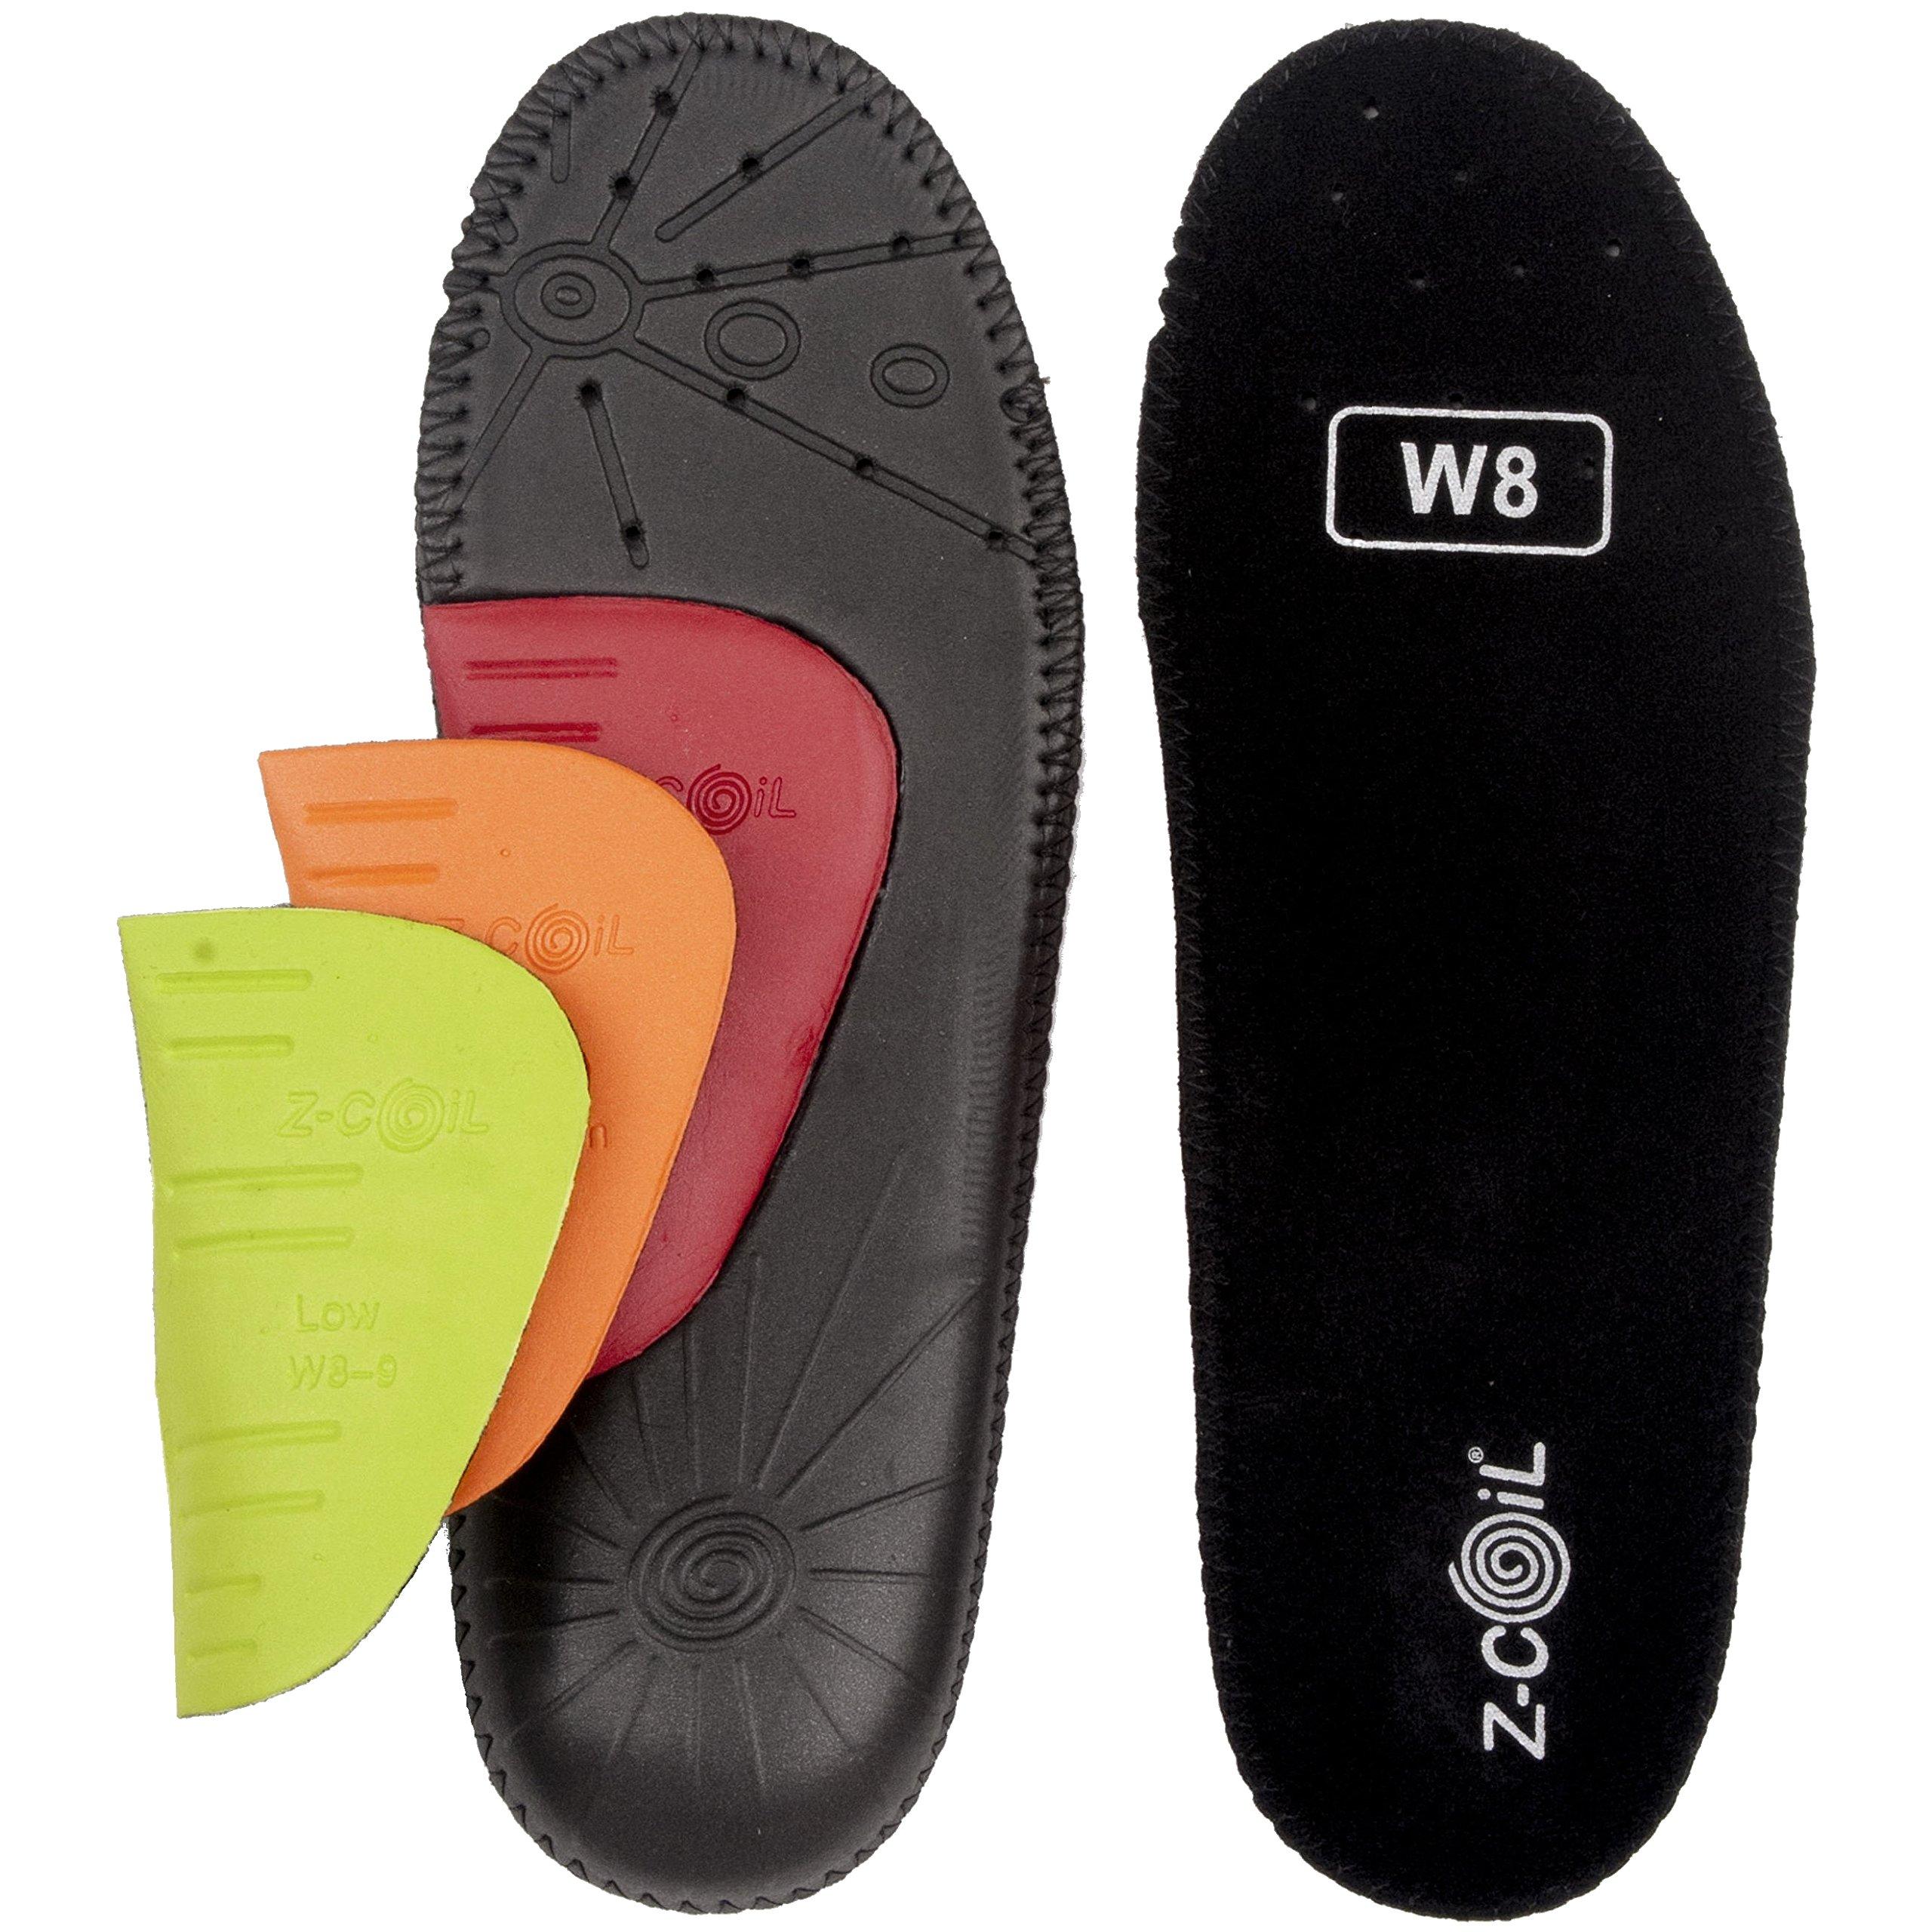 Z-CoiL Women's Z-Fit Black Custom Arch Insole (W 08, Black)